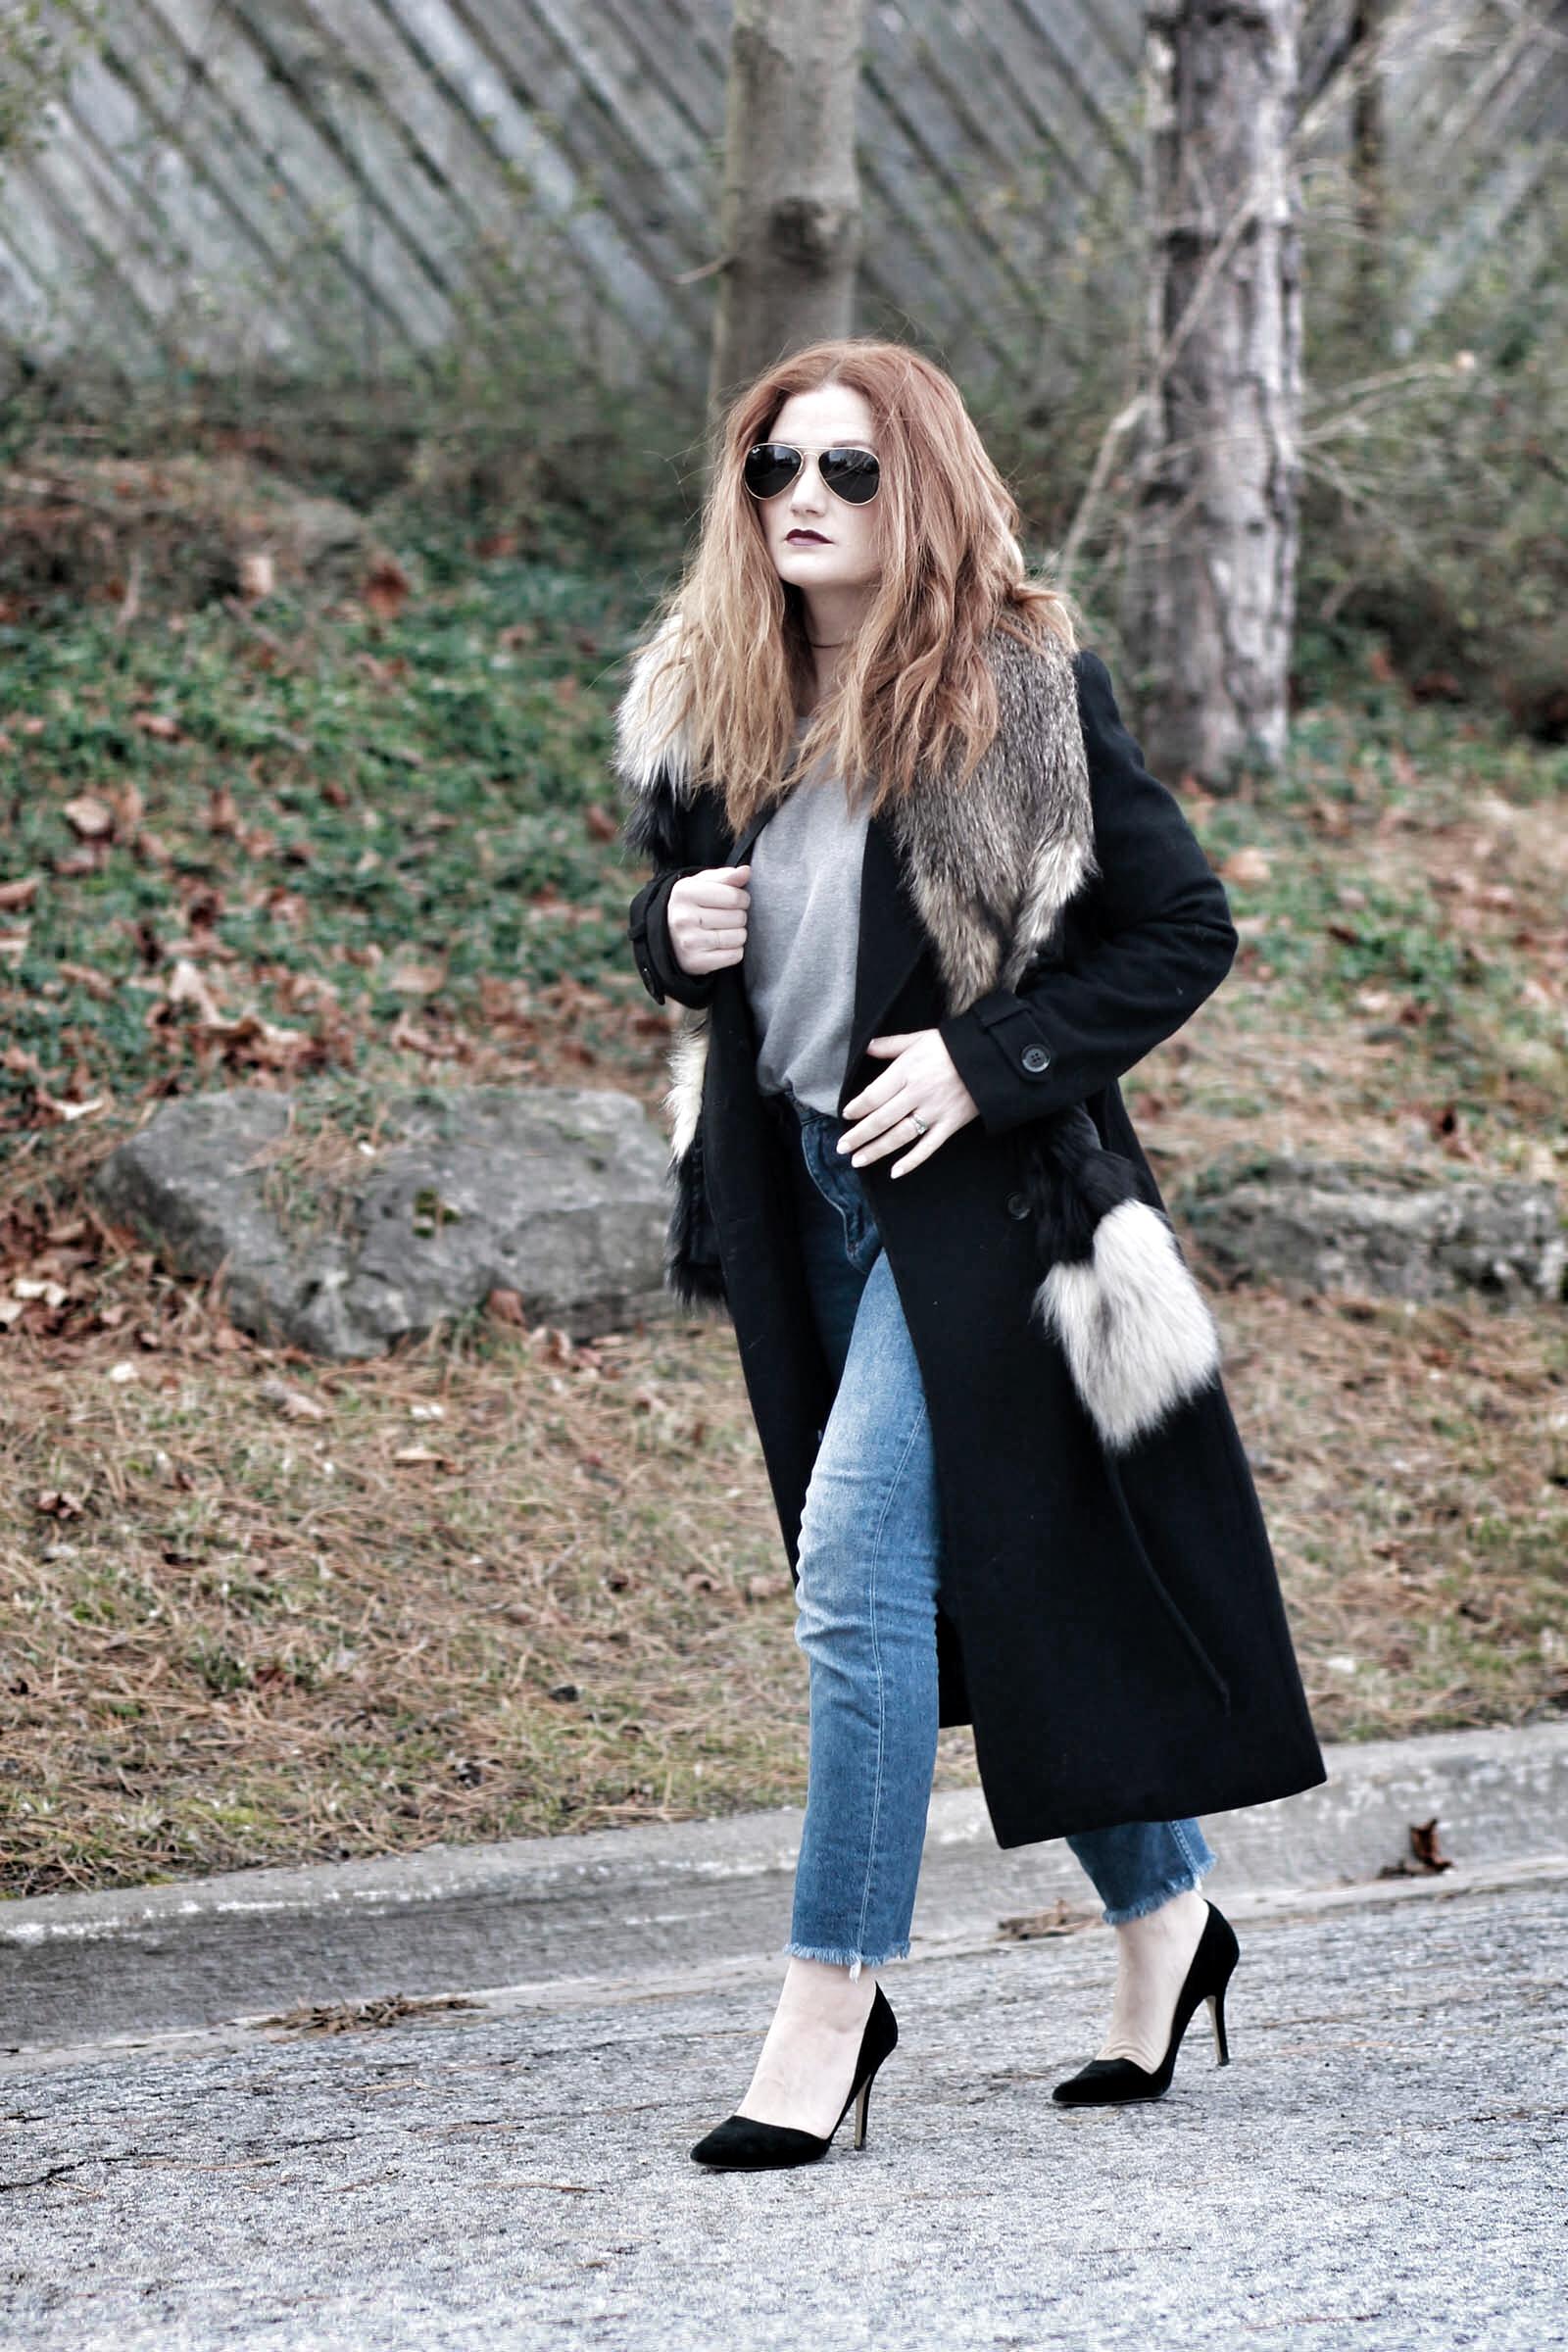 Wardrobe basics + fur scarf